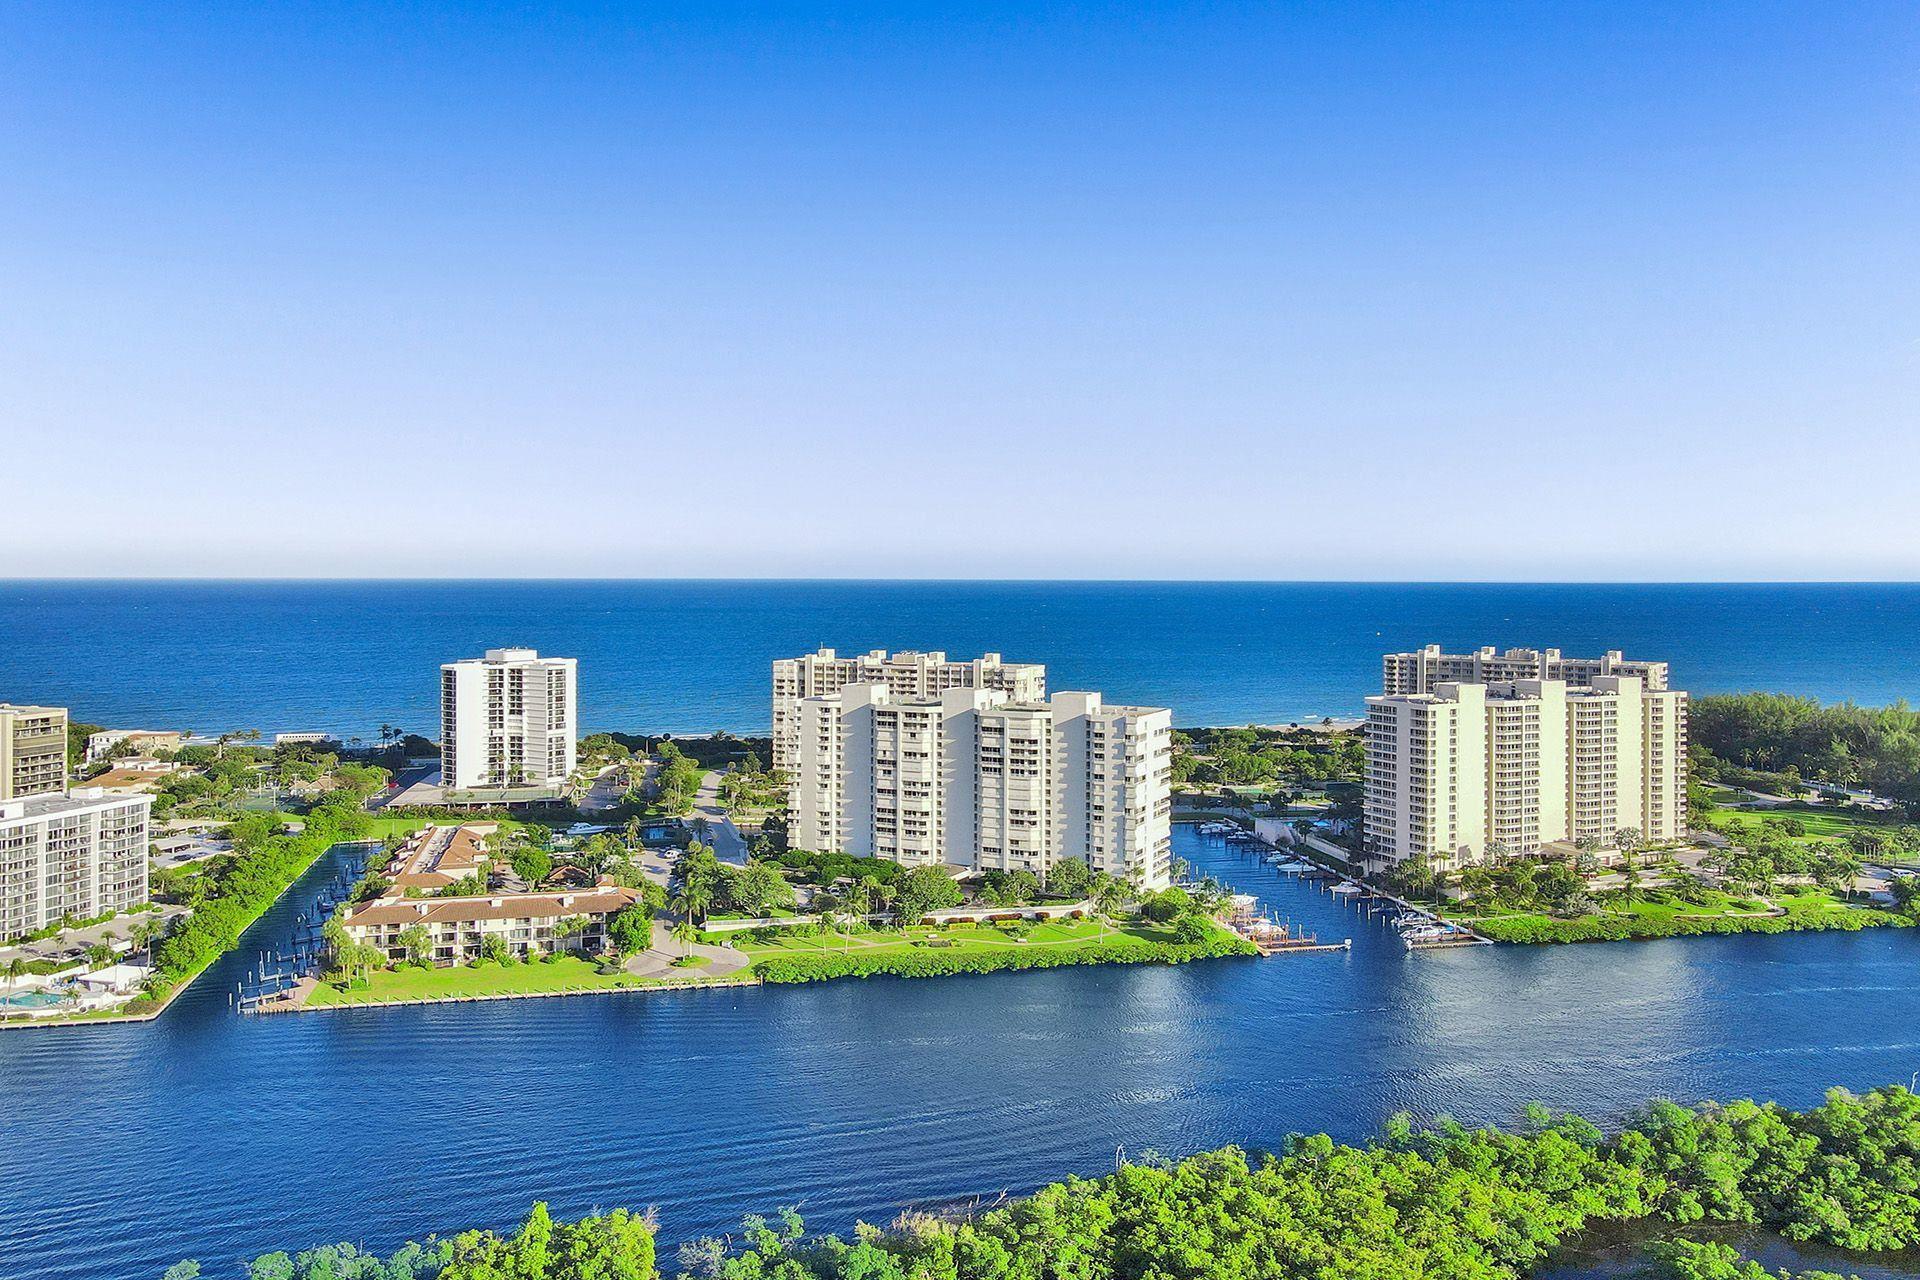 Photo of 4201 N Ocean Boulevard #C - 505, Boca Raton, FL 33431 (MLS # RX-10674625)